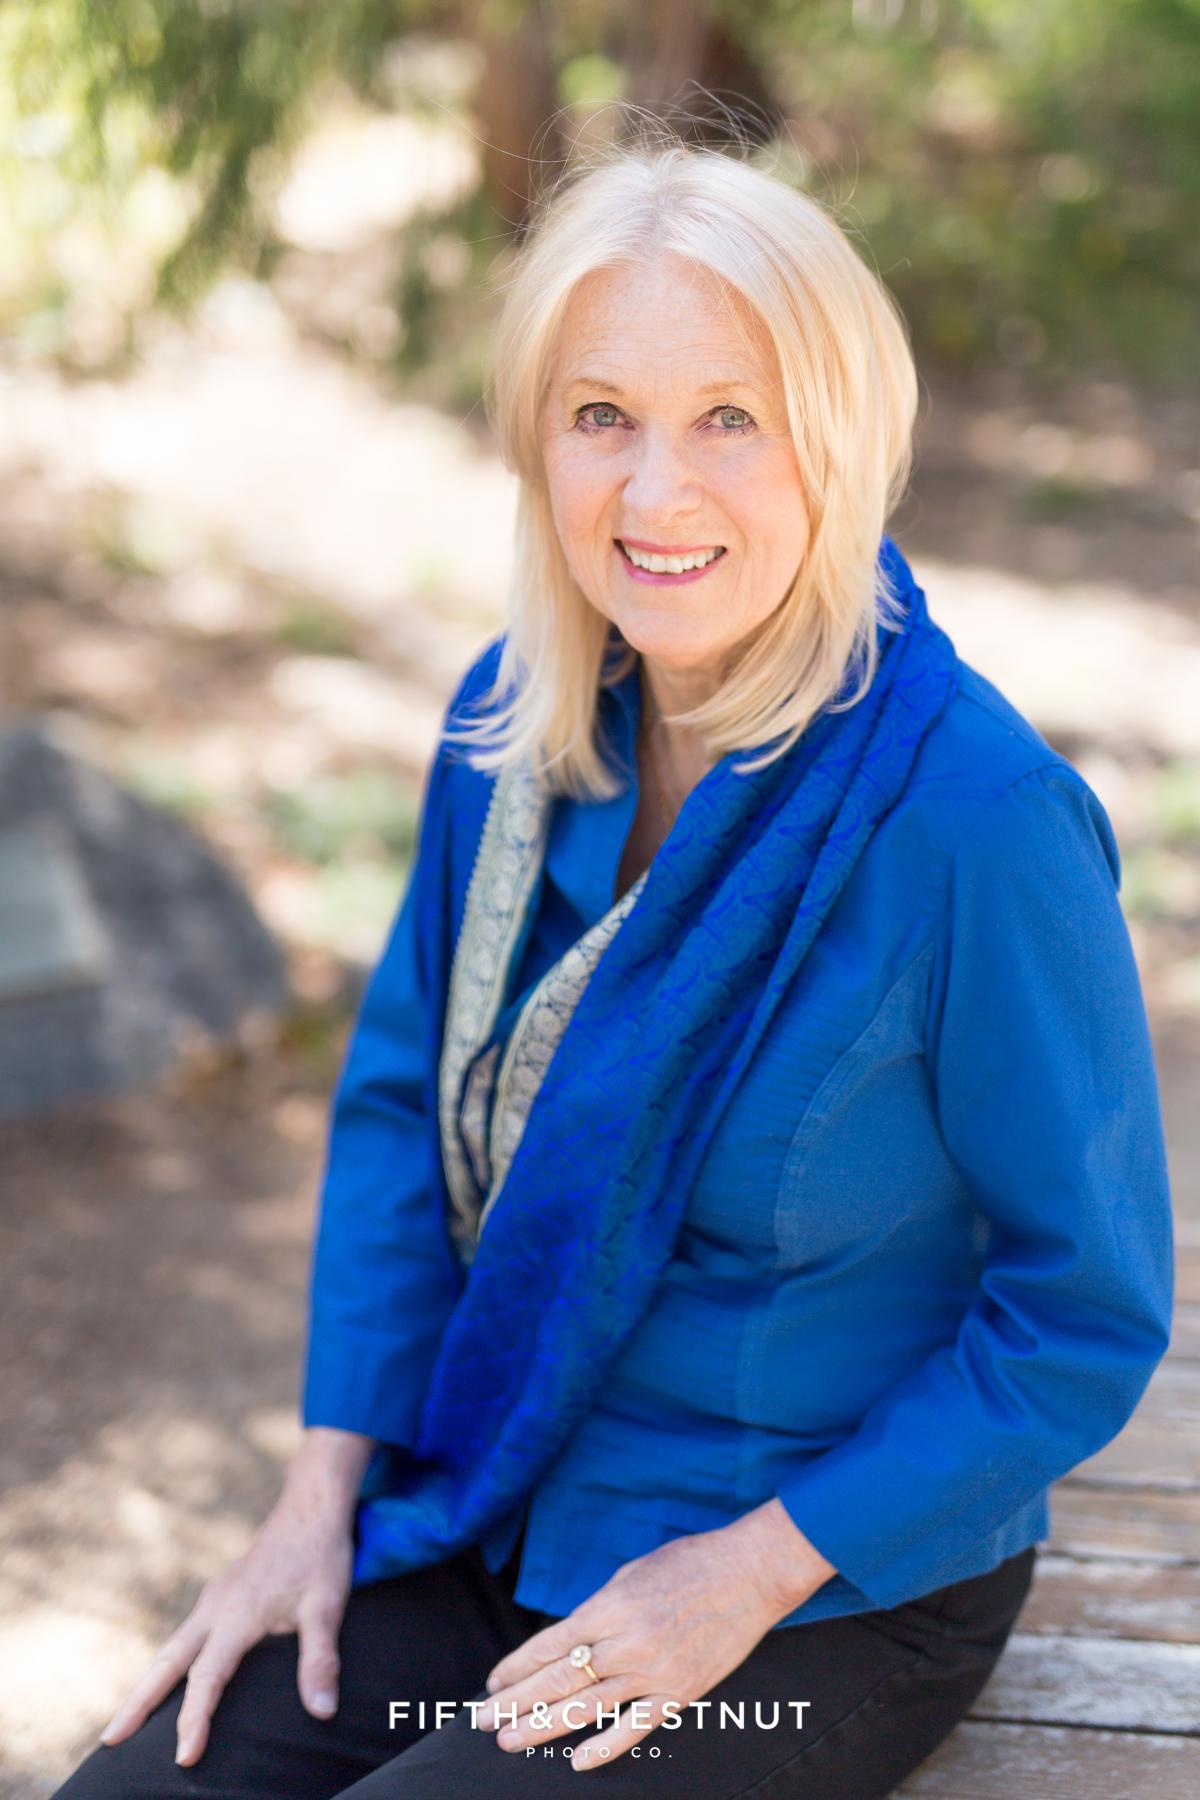 Vibrant Author headshot by Reno Headshot Photographer